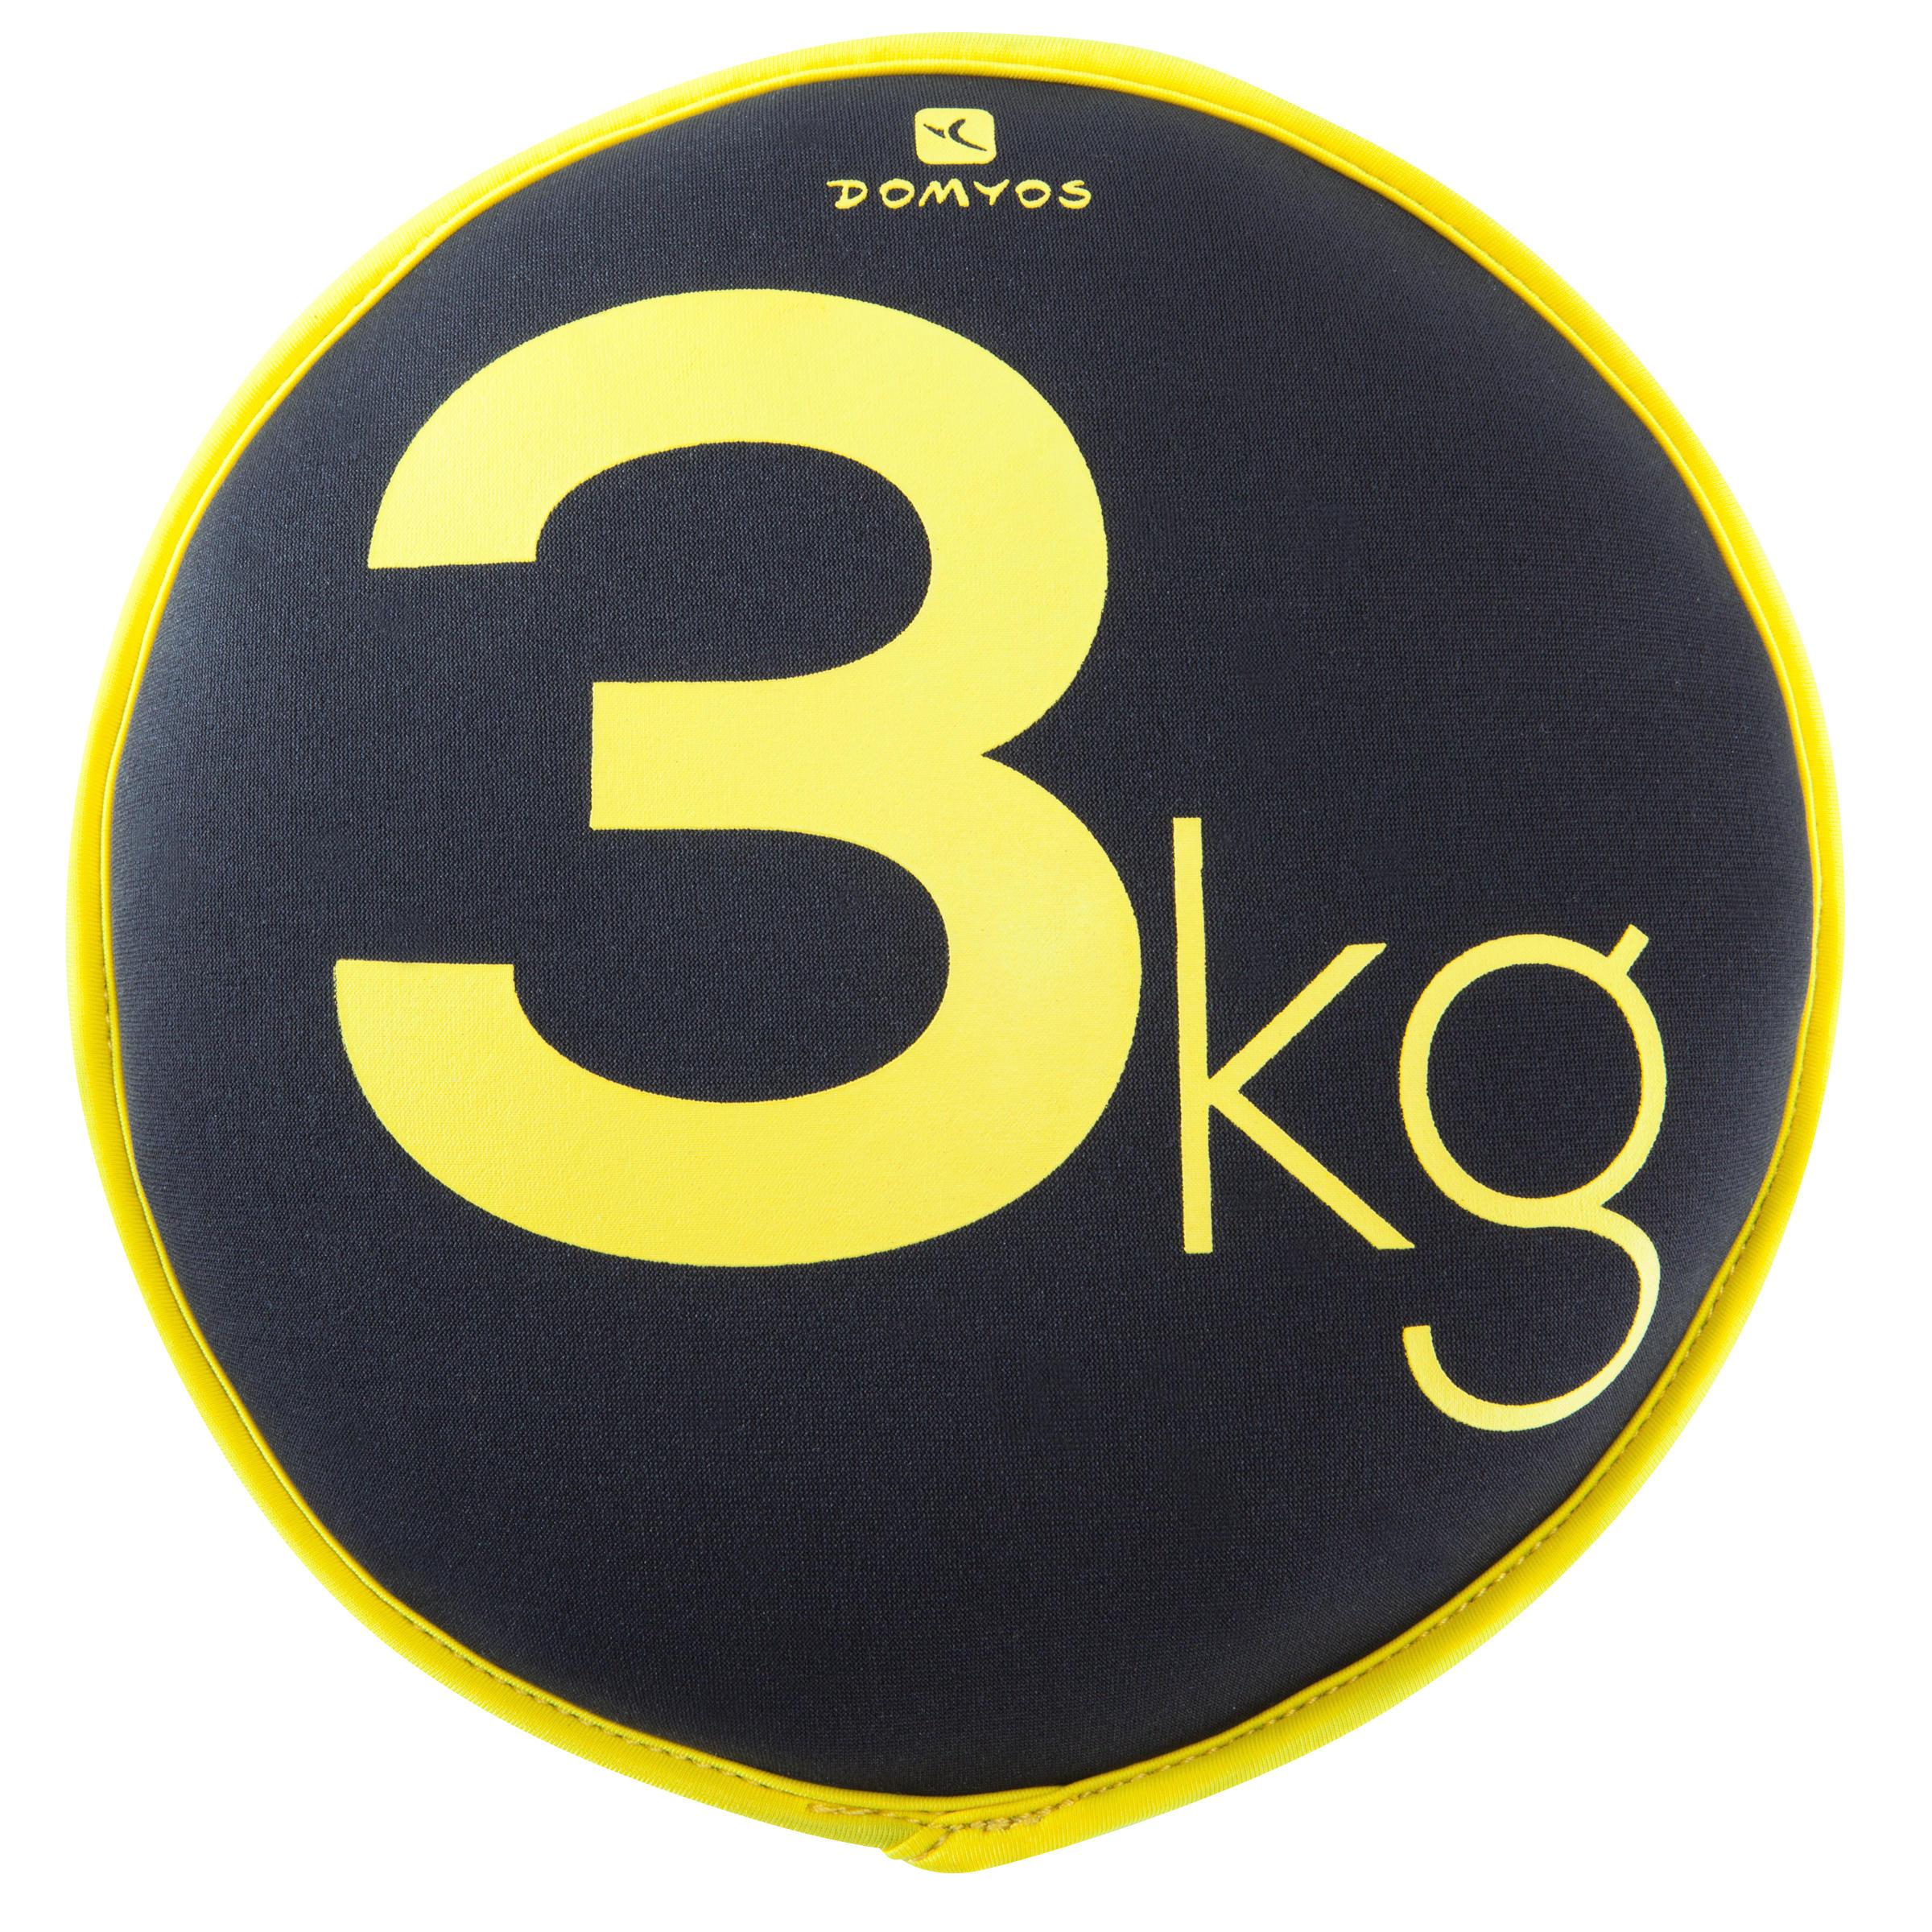 Domyos Soepele schijf met gewicht gym 3 kg